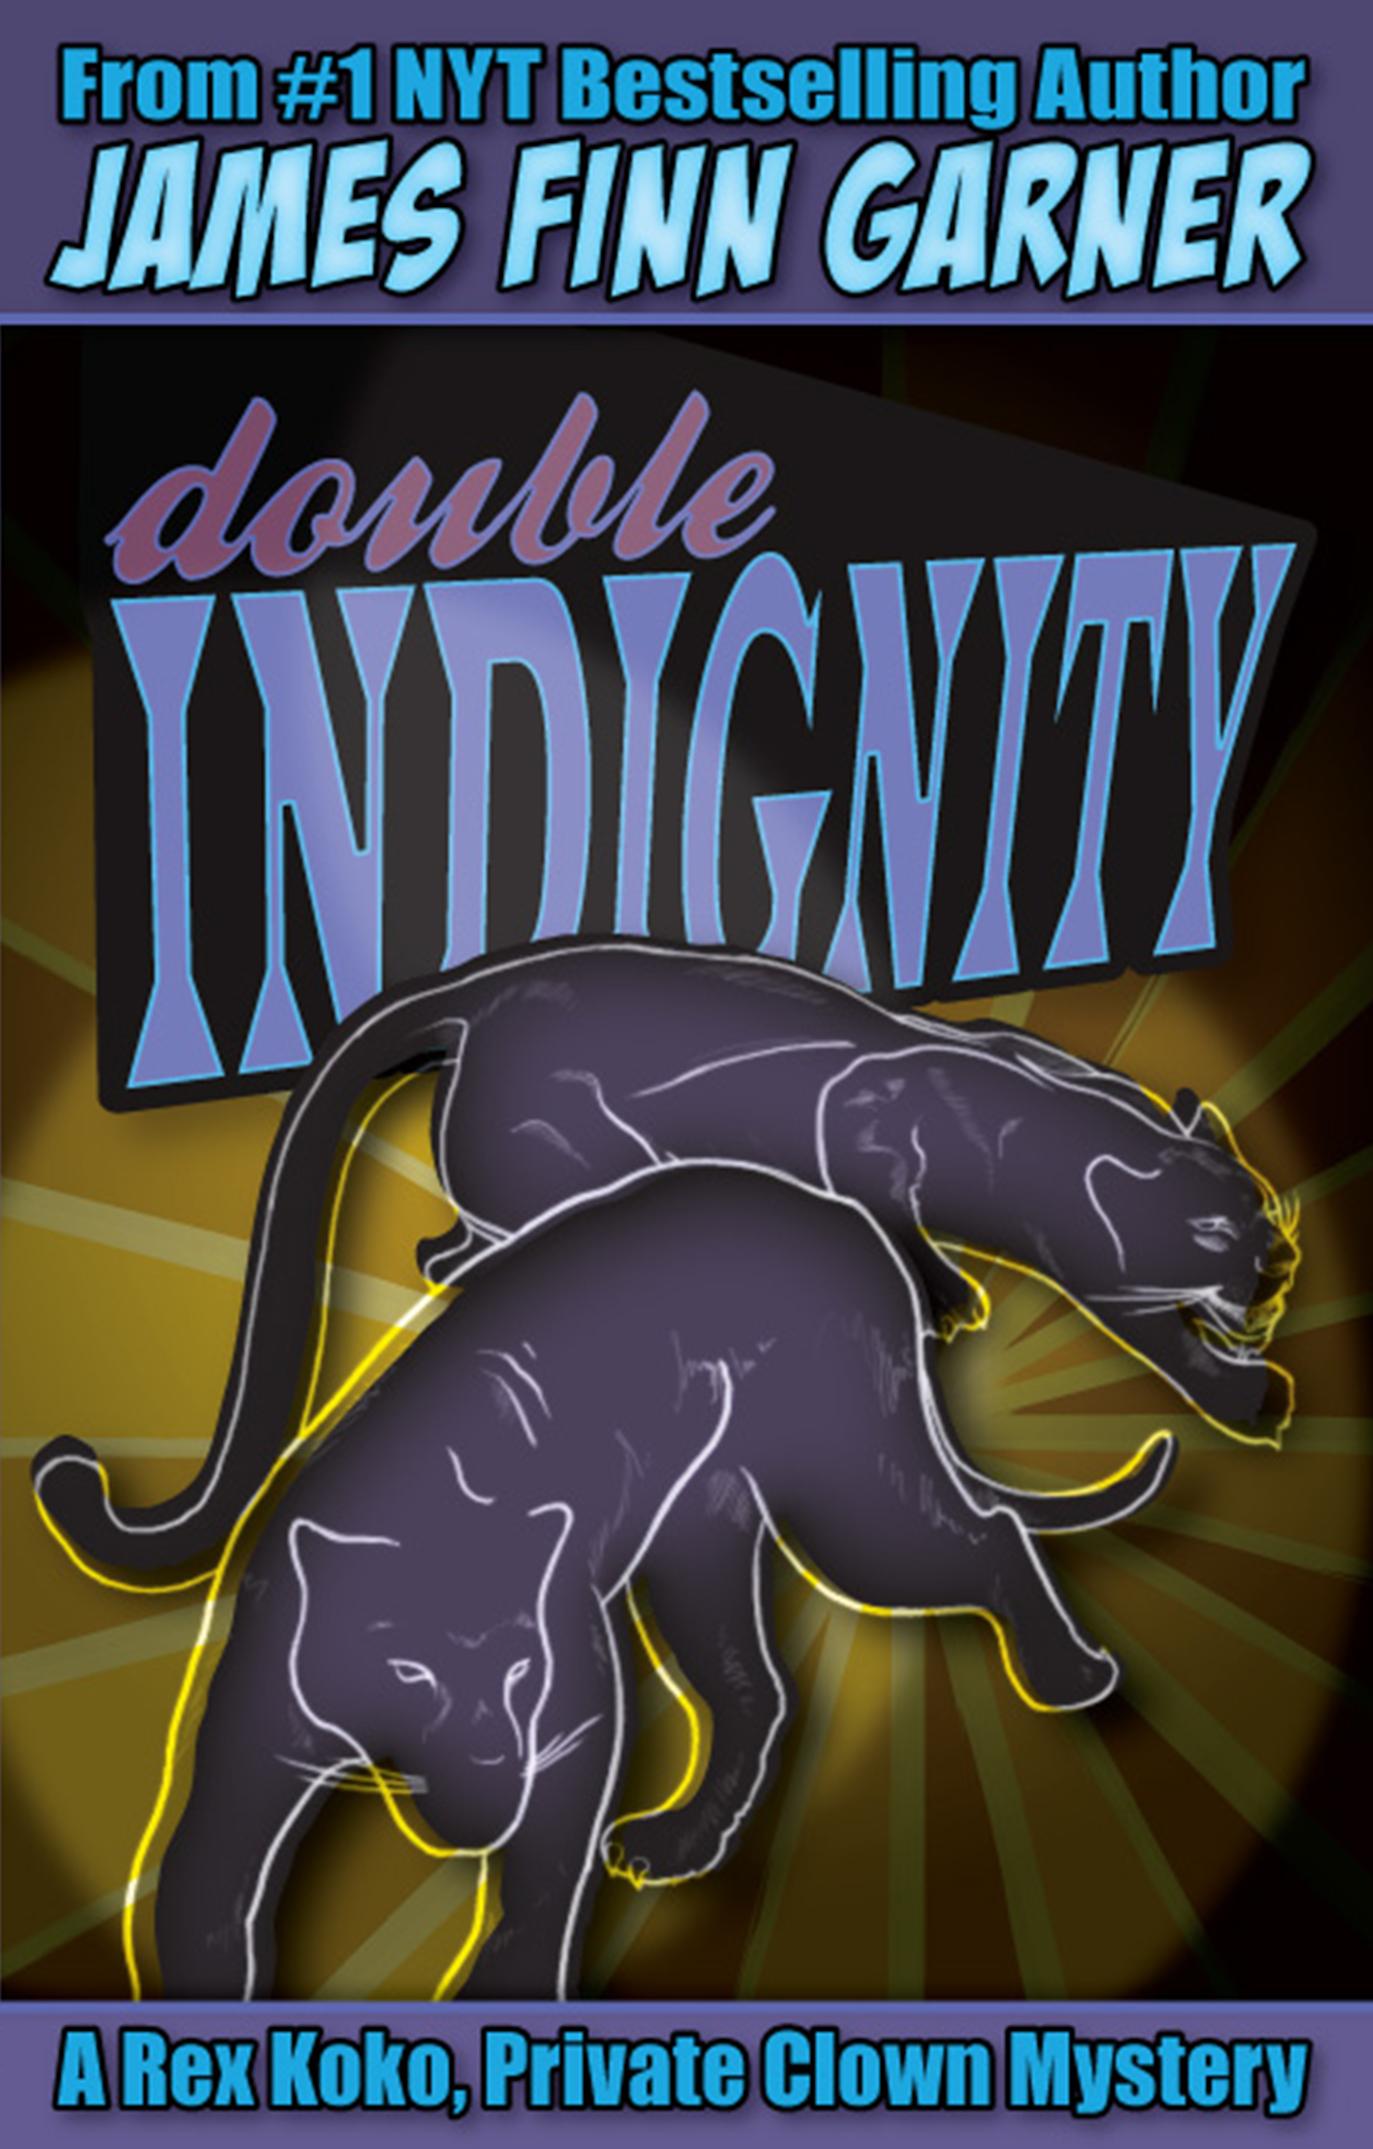 Double Indignity